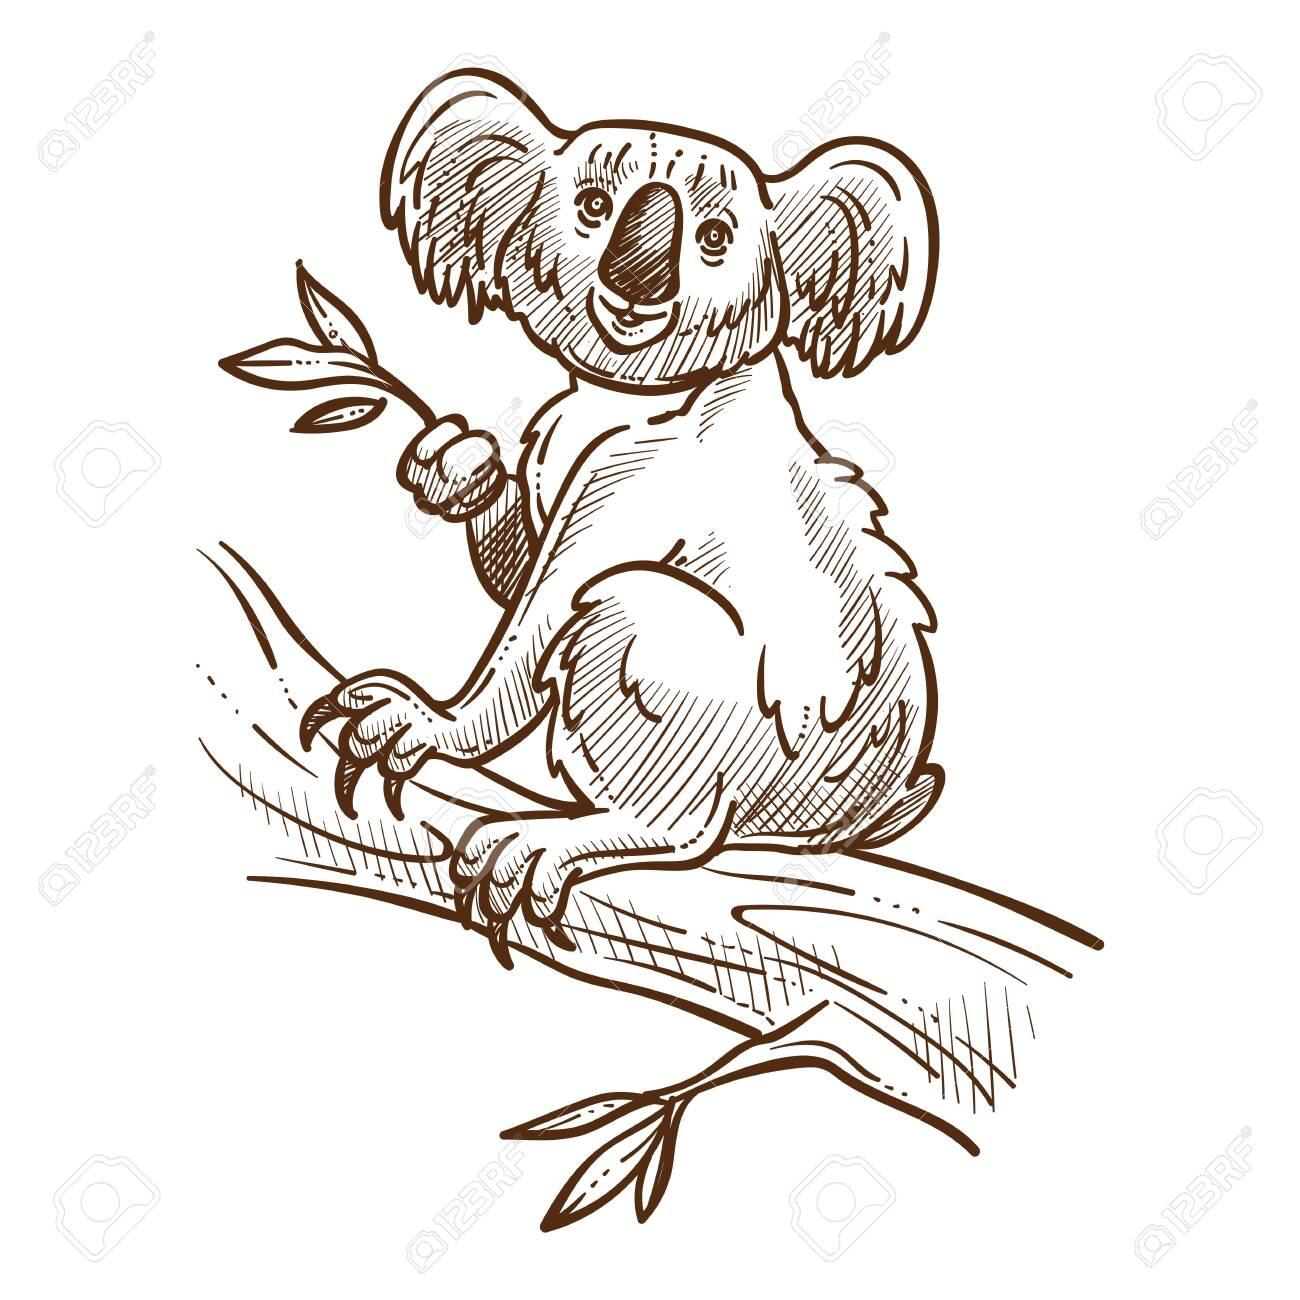 Australian symbol, koala bear on tree branch eating eucalyptus - 131924867